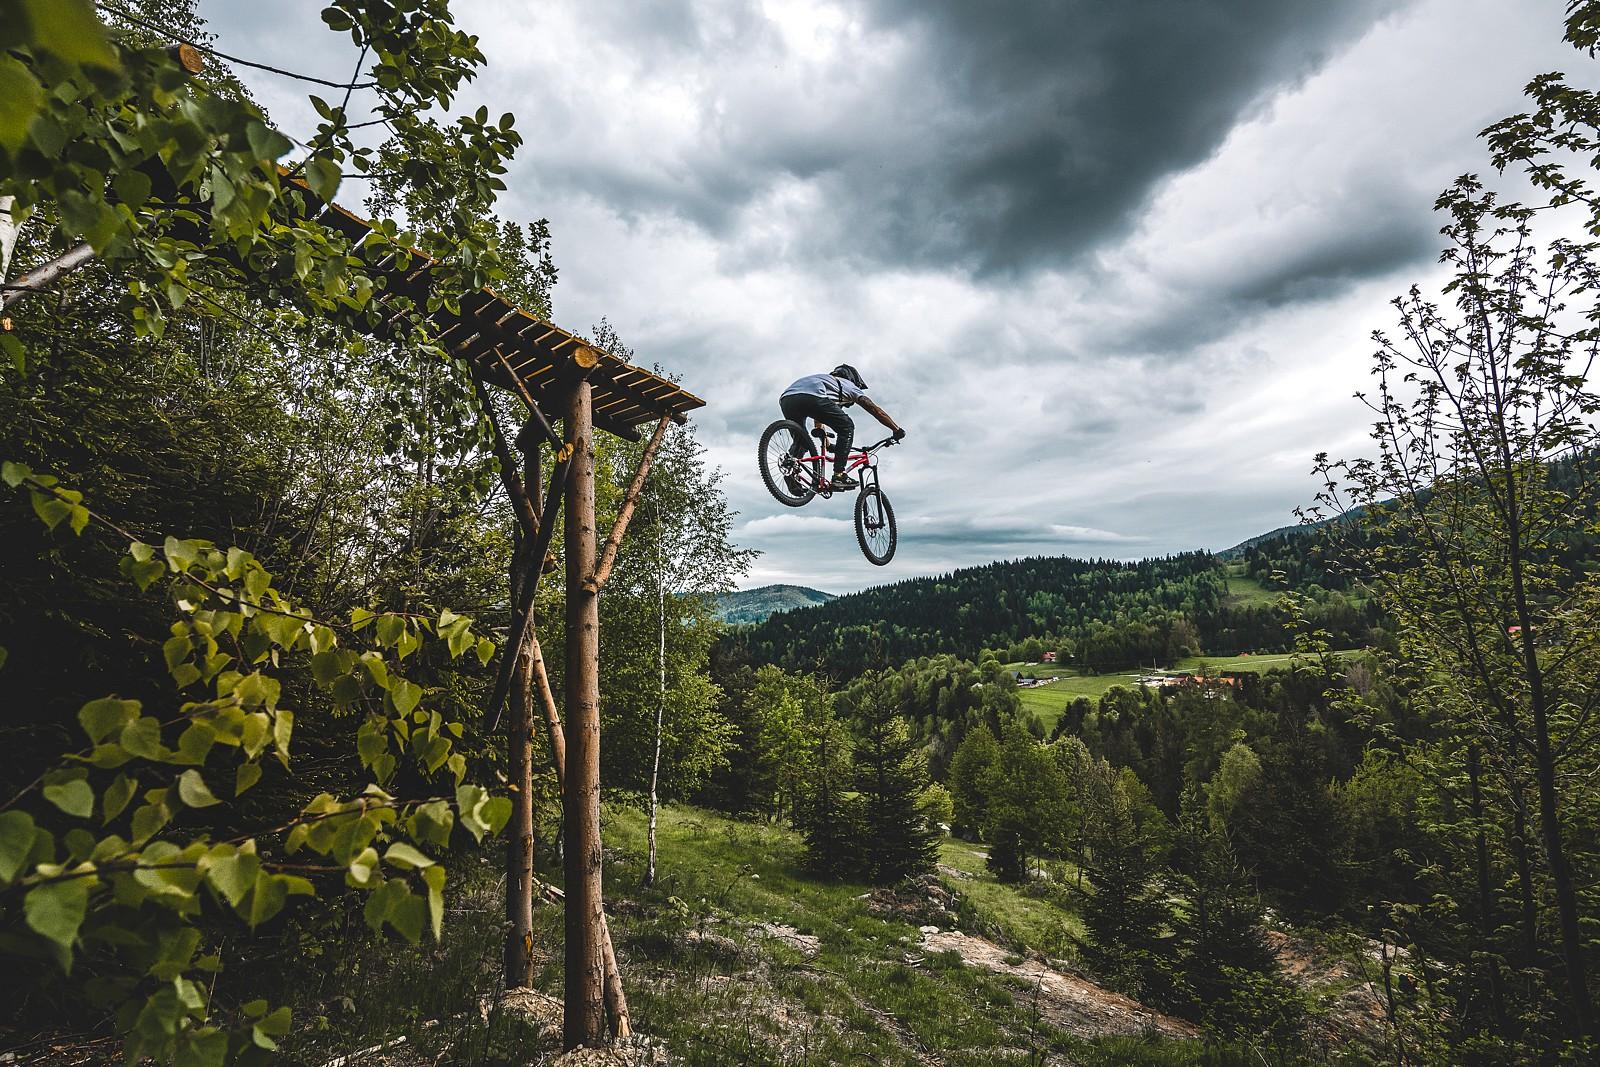 droppin' - Banan - Mountain Biking Pictures - Vital MTB